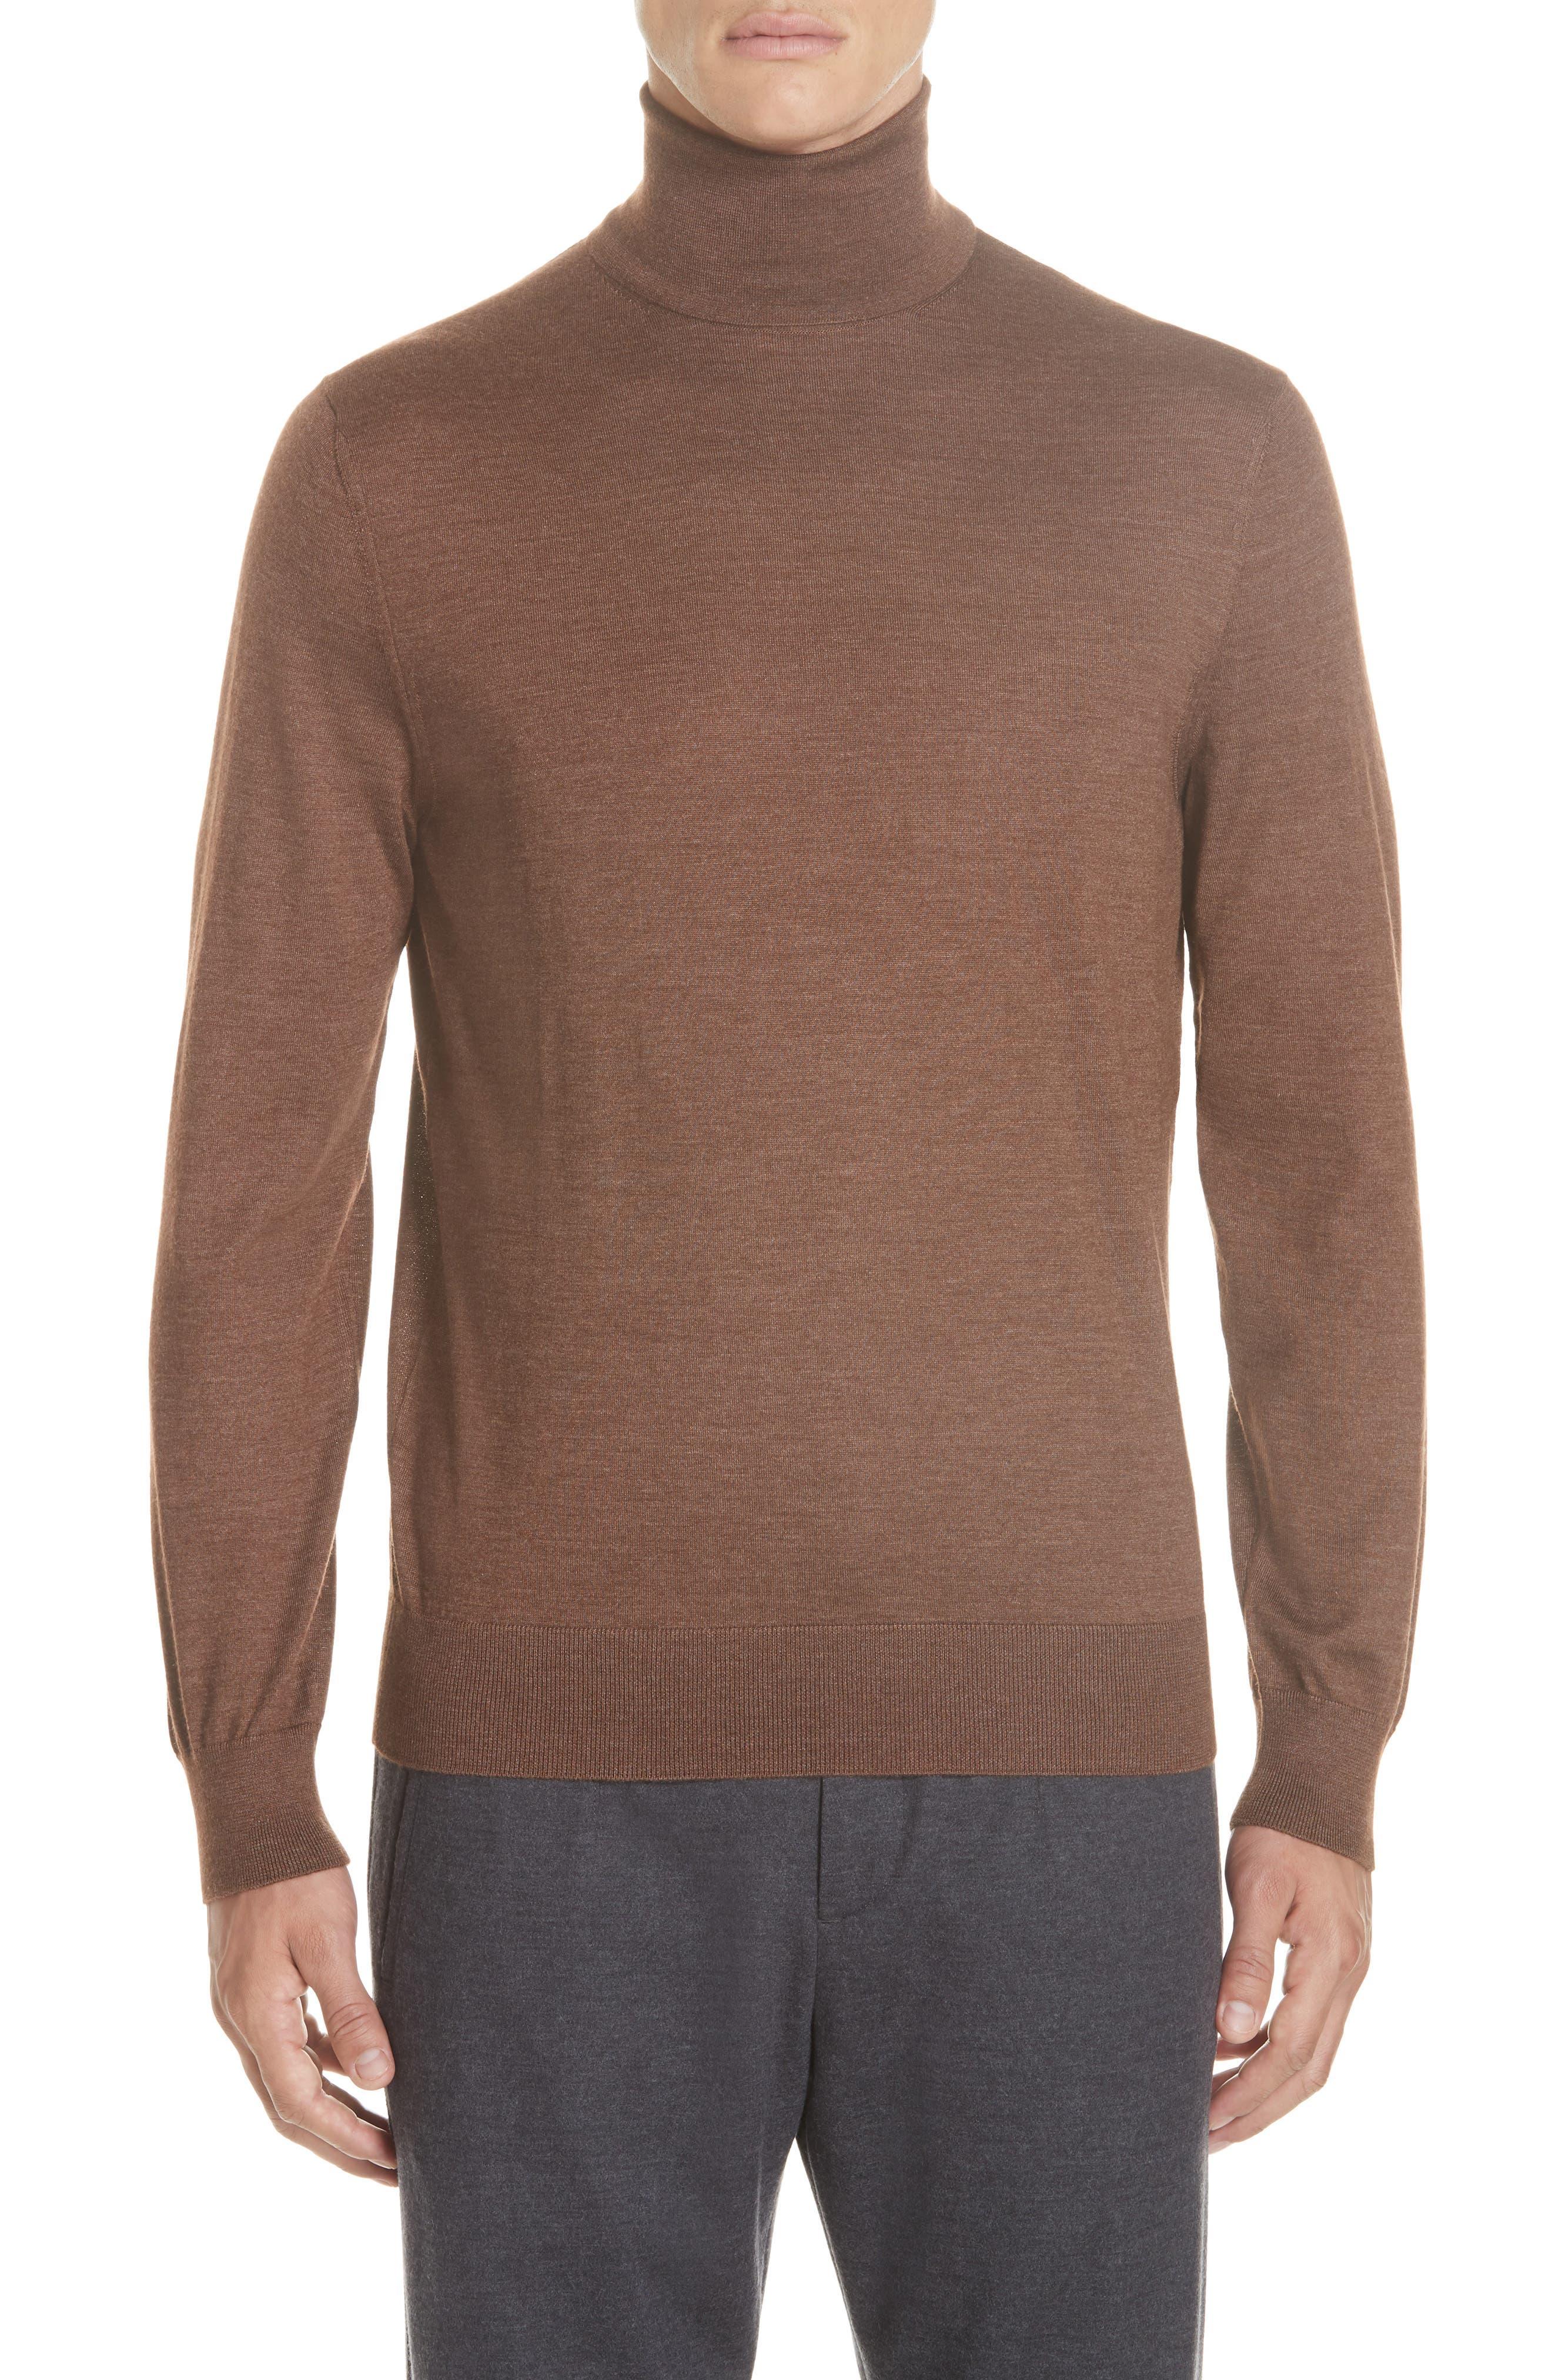 Cashmere & Silk Turtleneck Sweater,                             Main thumbnail 1, color,                             252